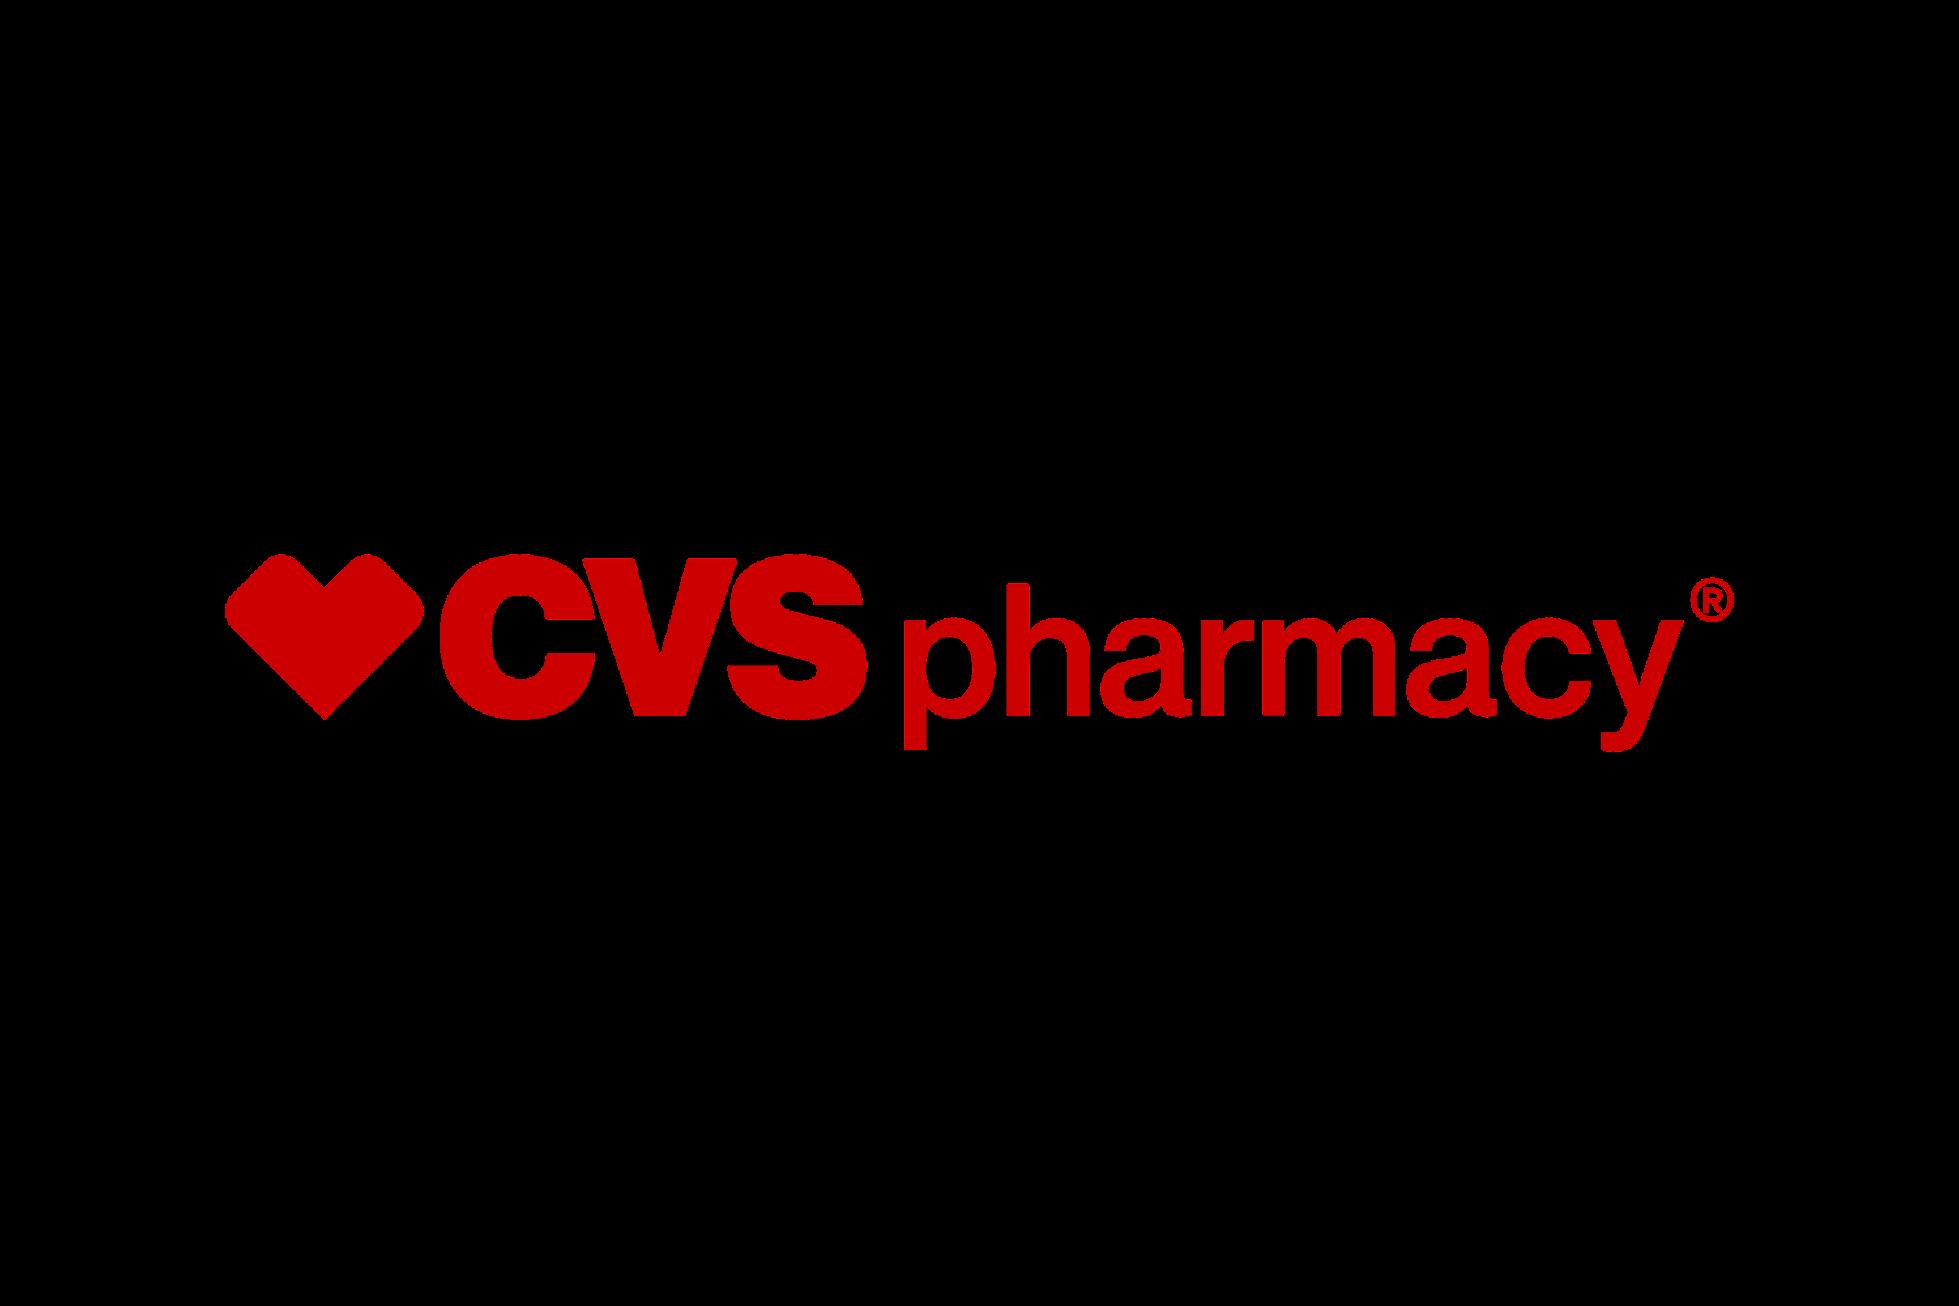 Cvs pharmacy logo.wine